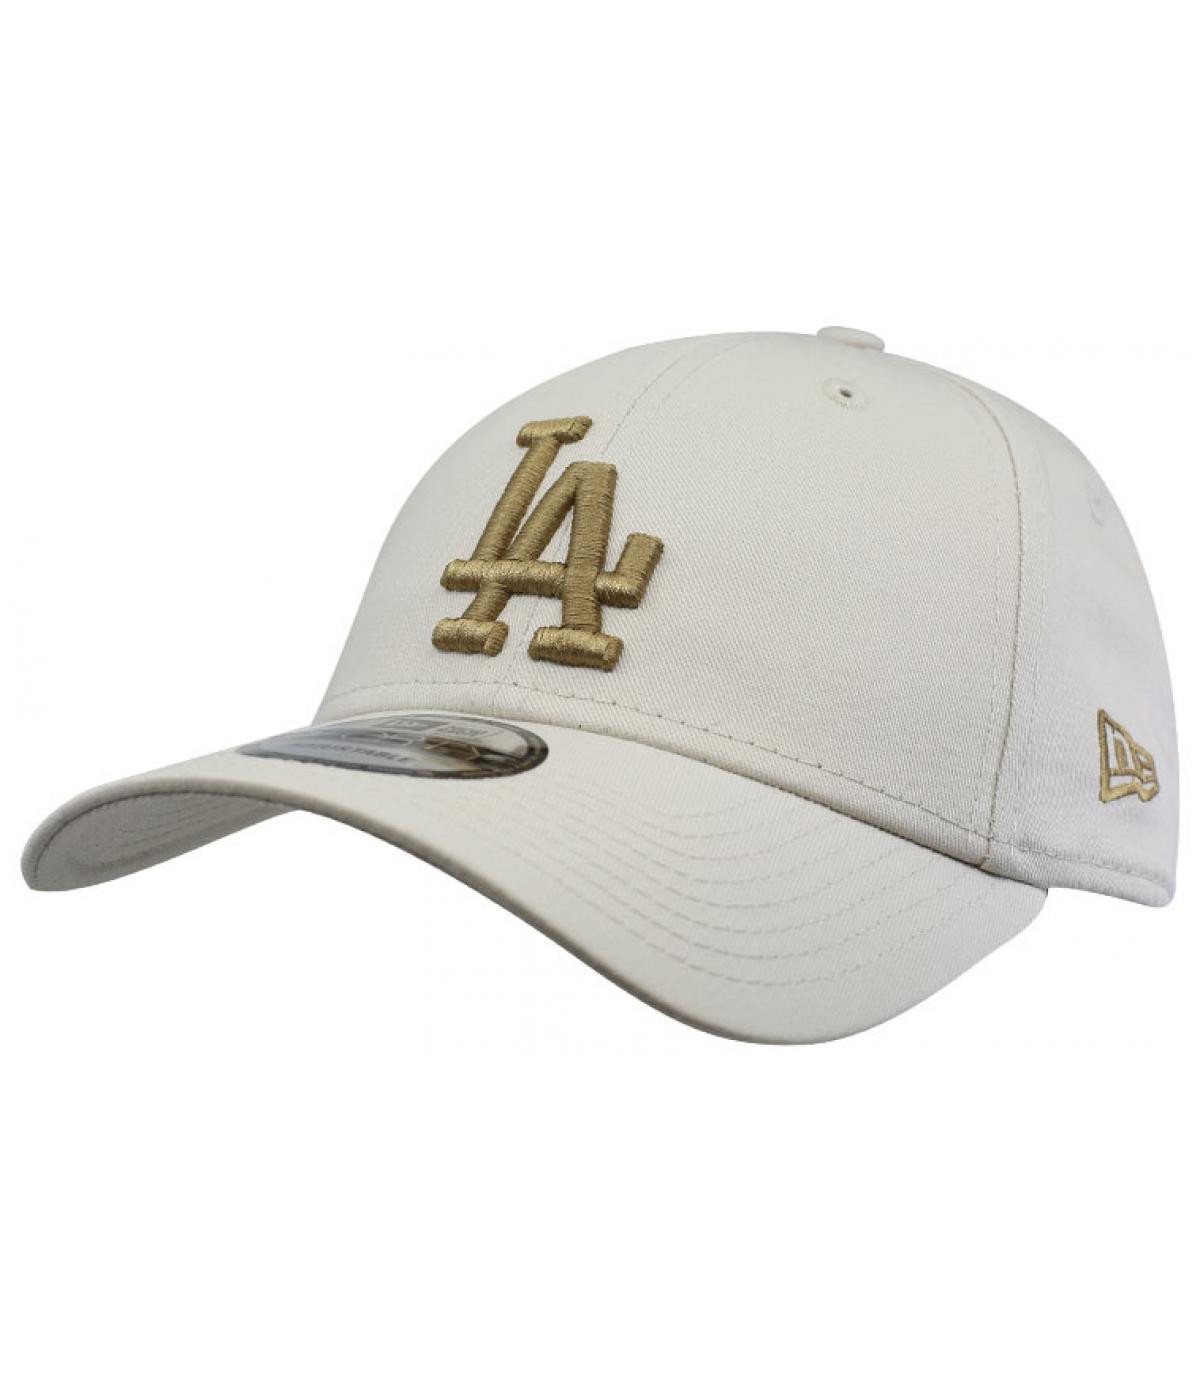 LA white beige cap